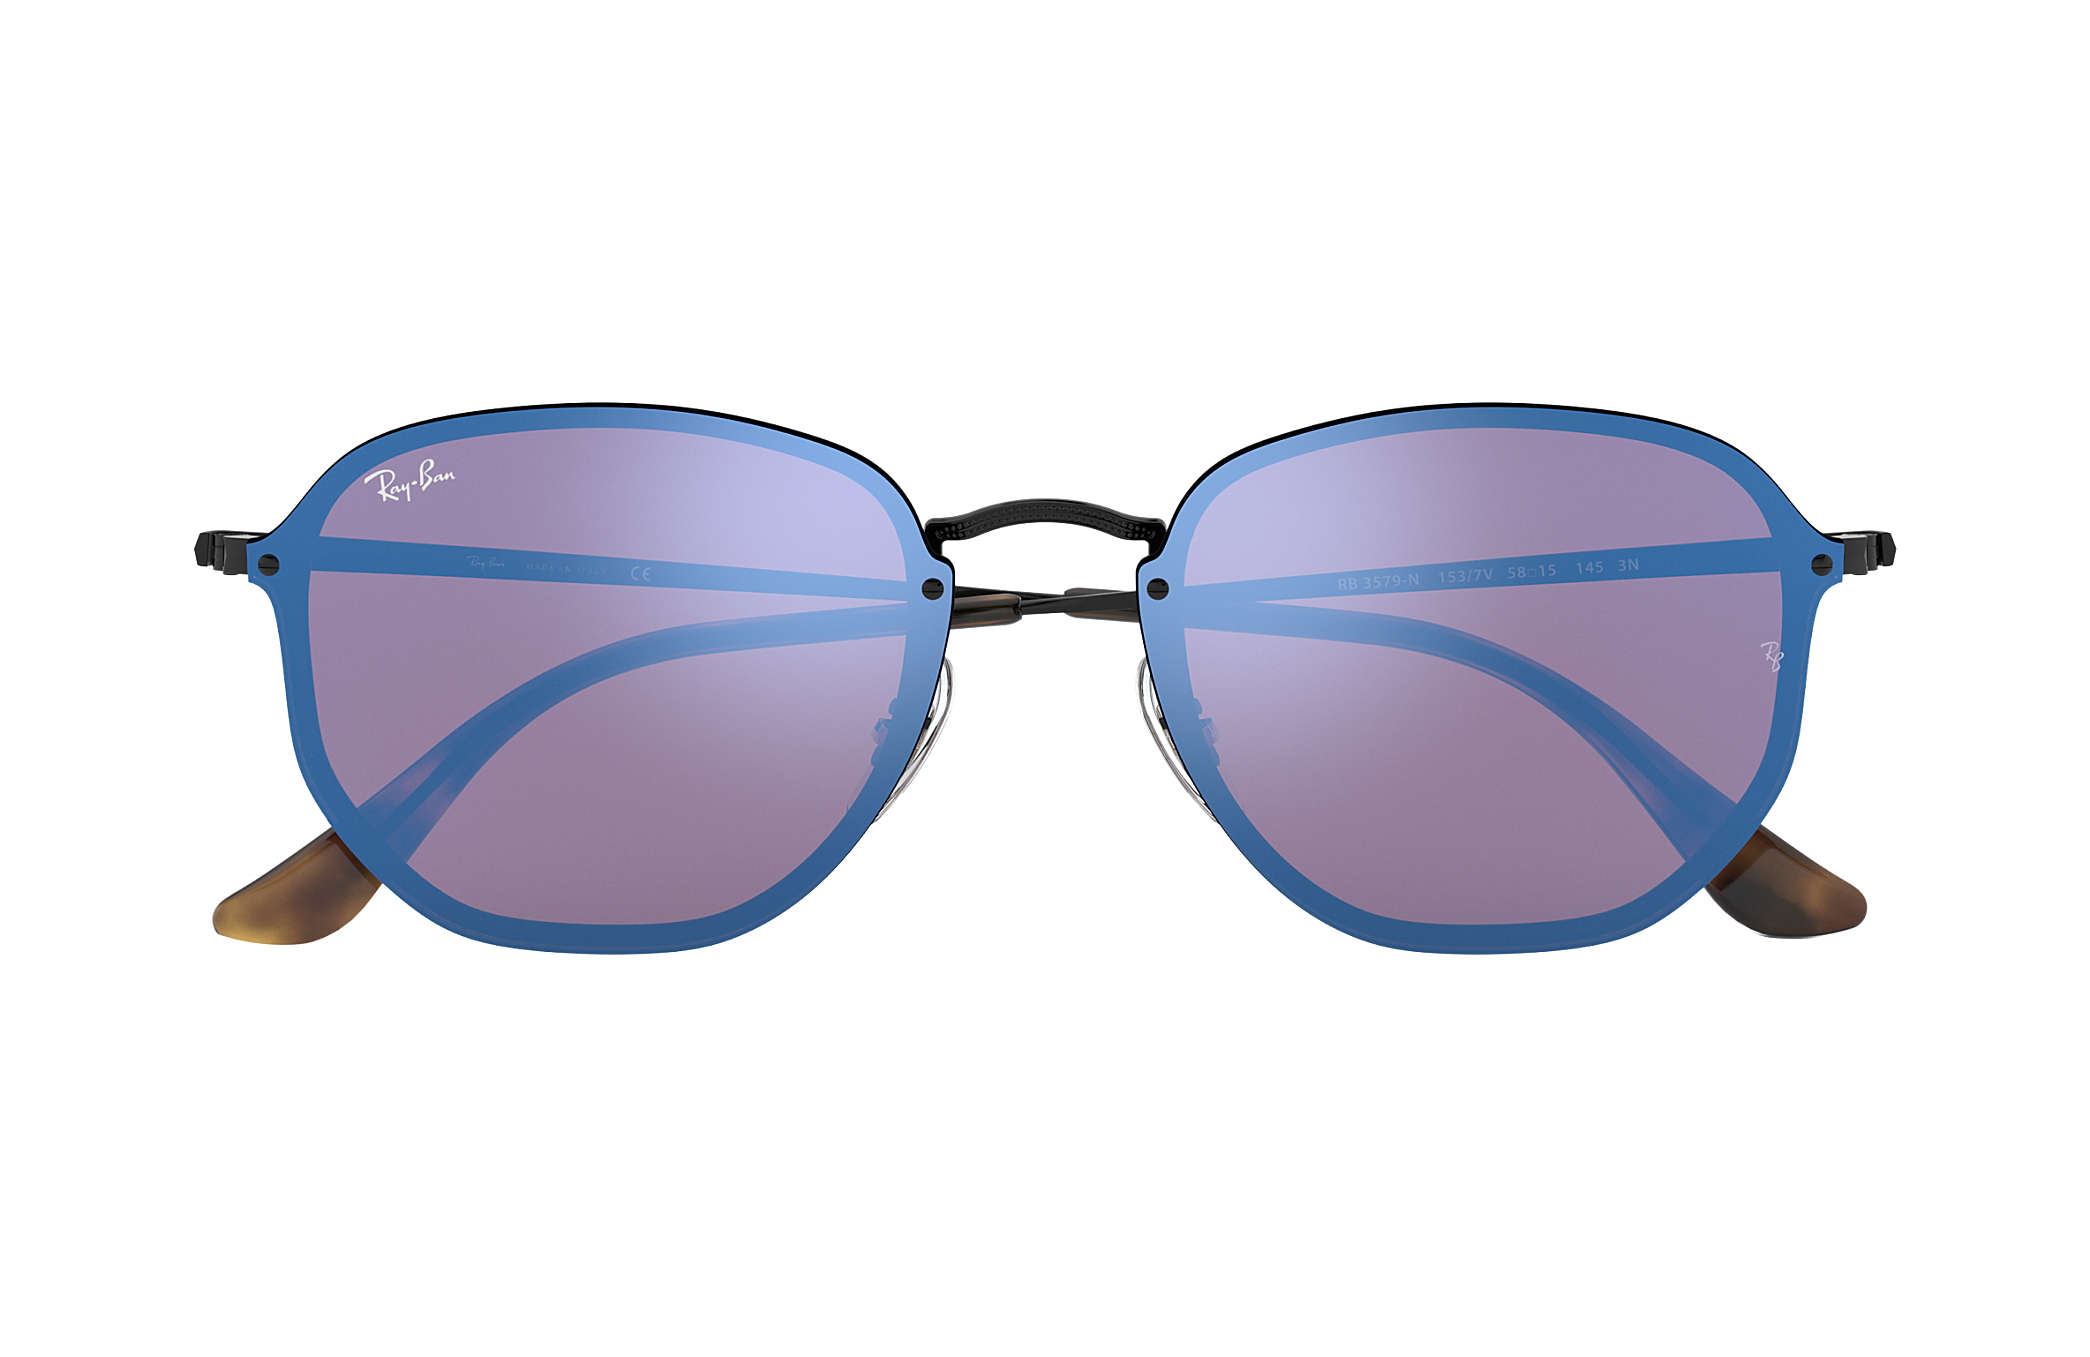 66e3887d92 Ray-Ban Blaze Hexagonal RB3579N Black - Metal - Violet Blue Lenses ...